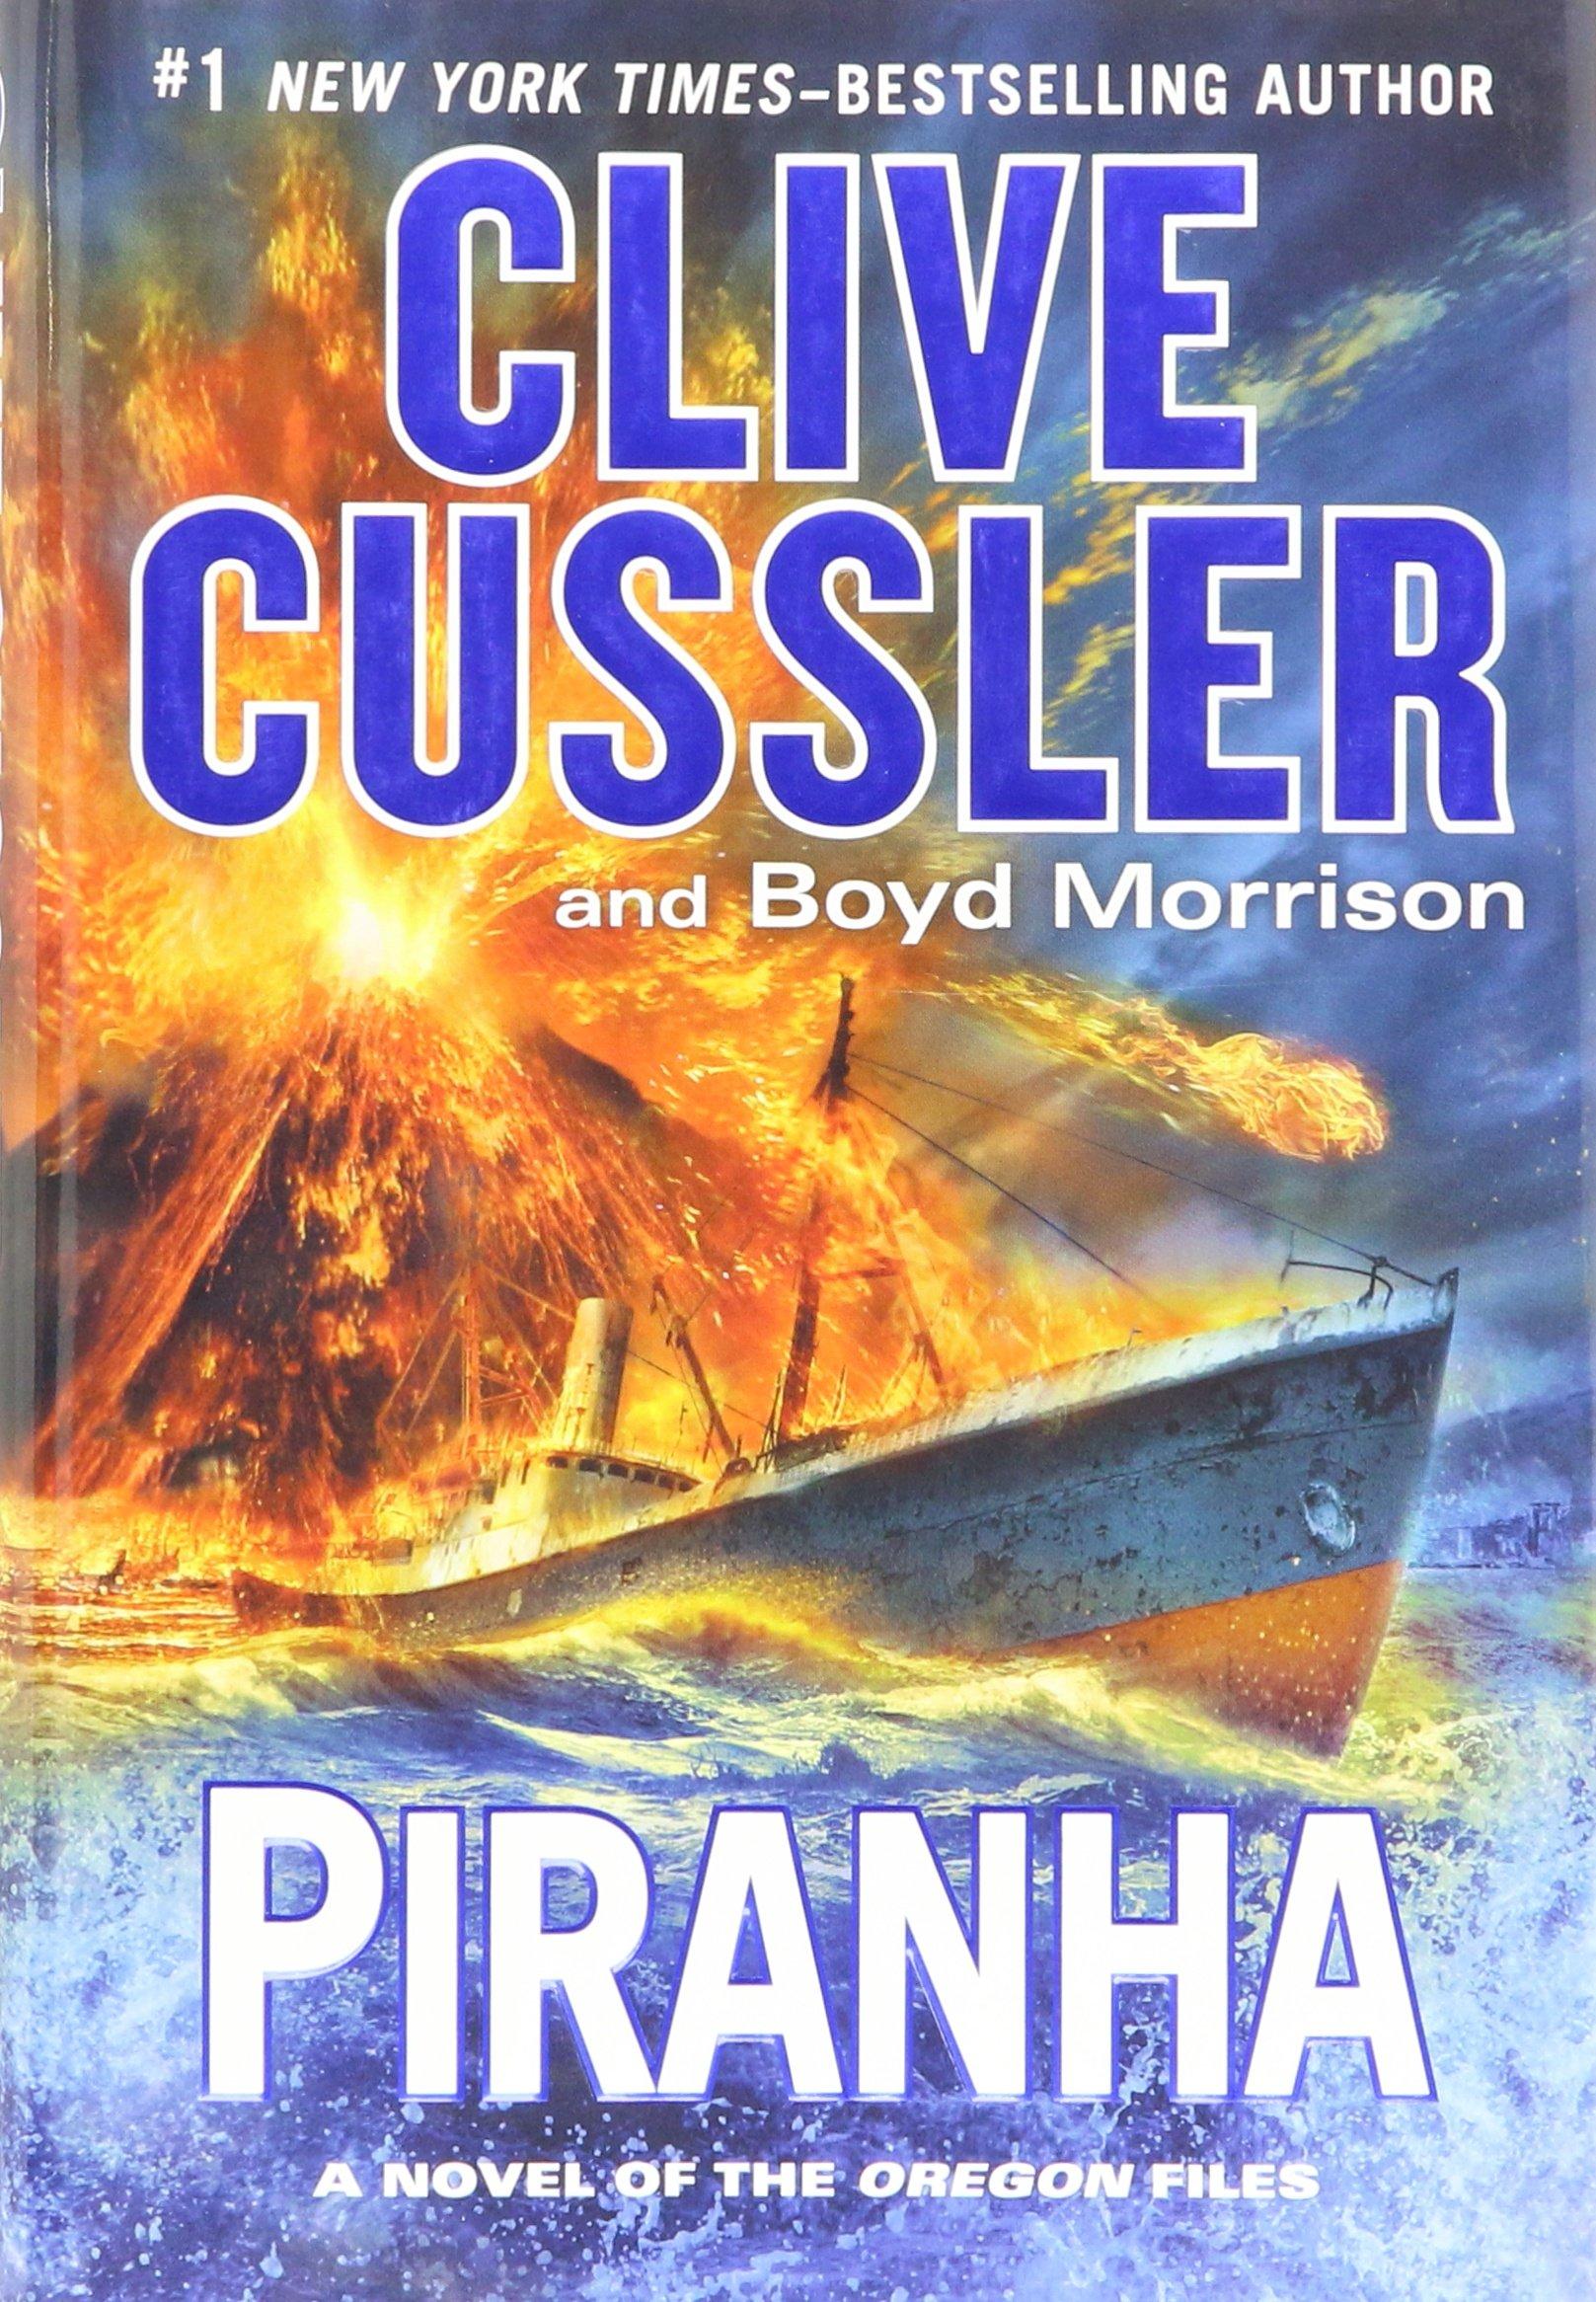 Piranha (The Oregon Files): Amazon.co.uk: Clive Cussler, Boyd Morrison:  Books